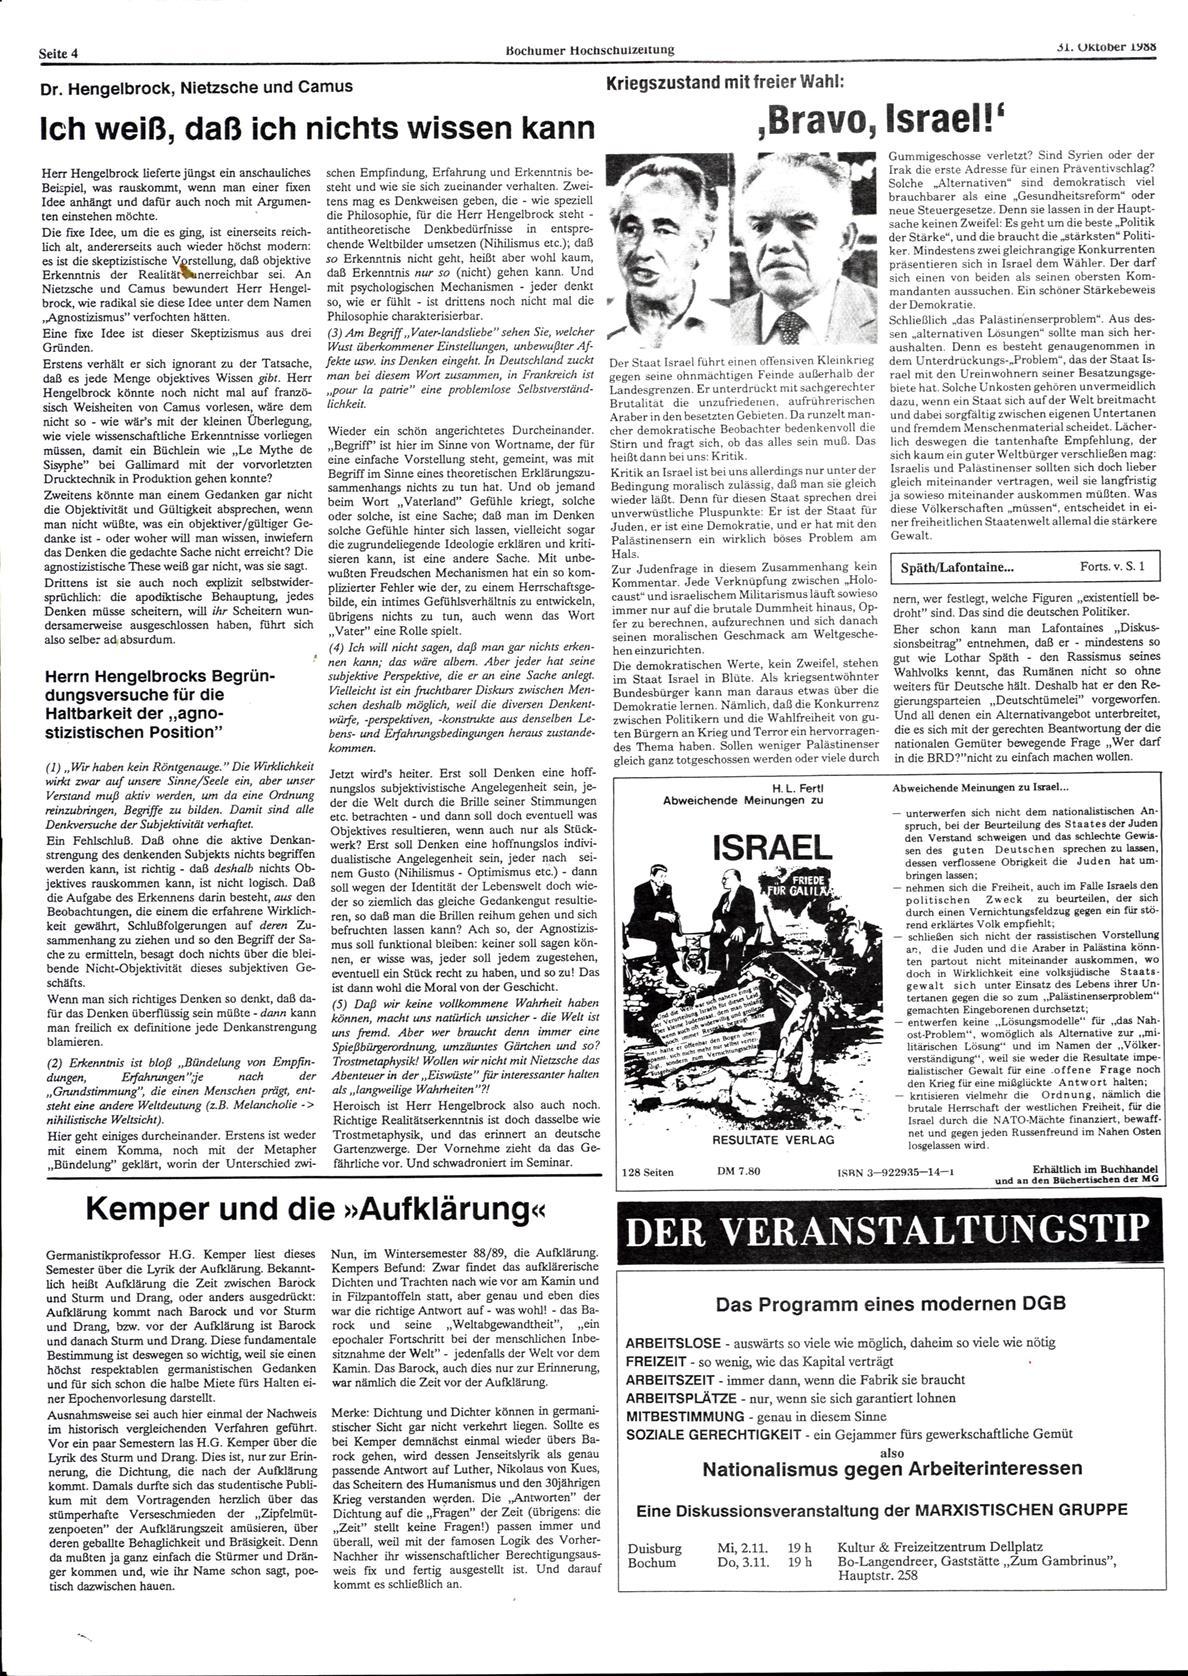 Bochum_BHZ_19881031_180_004